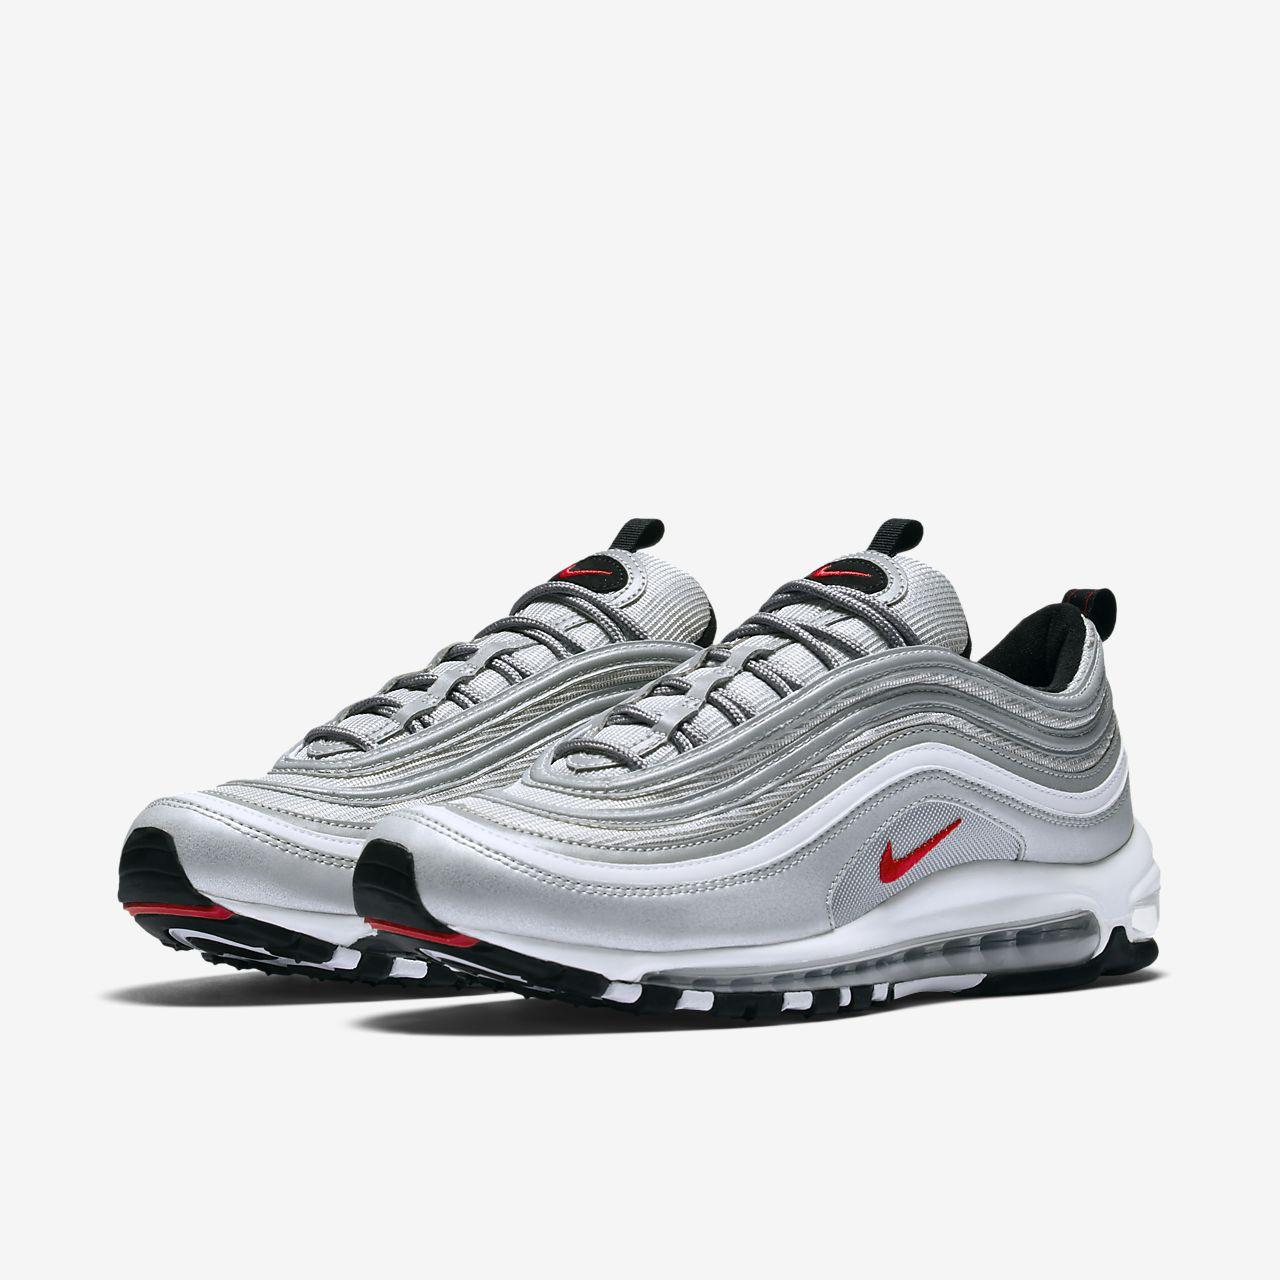 scarpa uomo nike air max 97